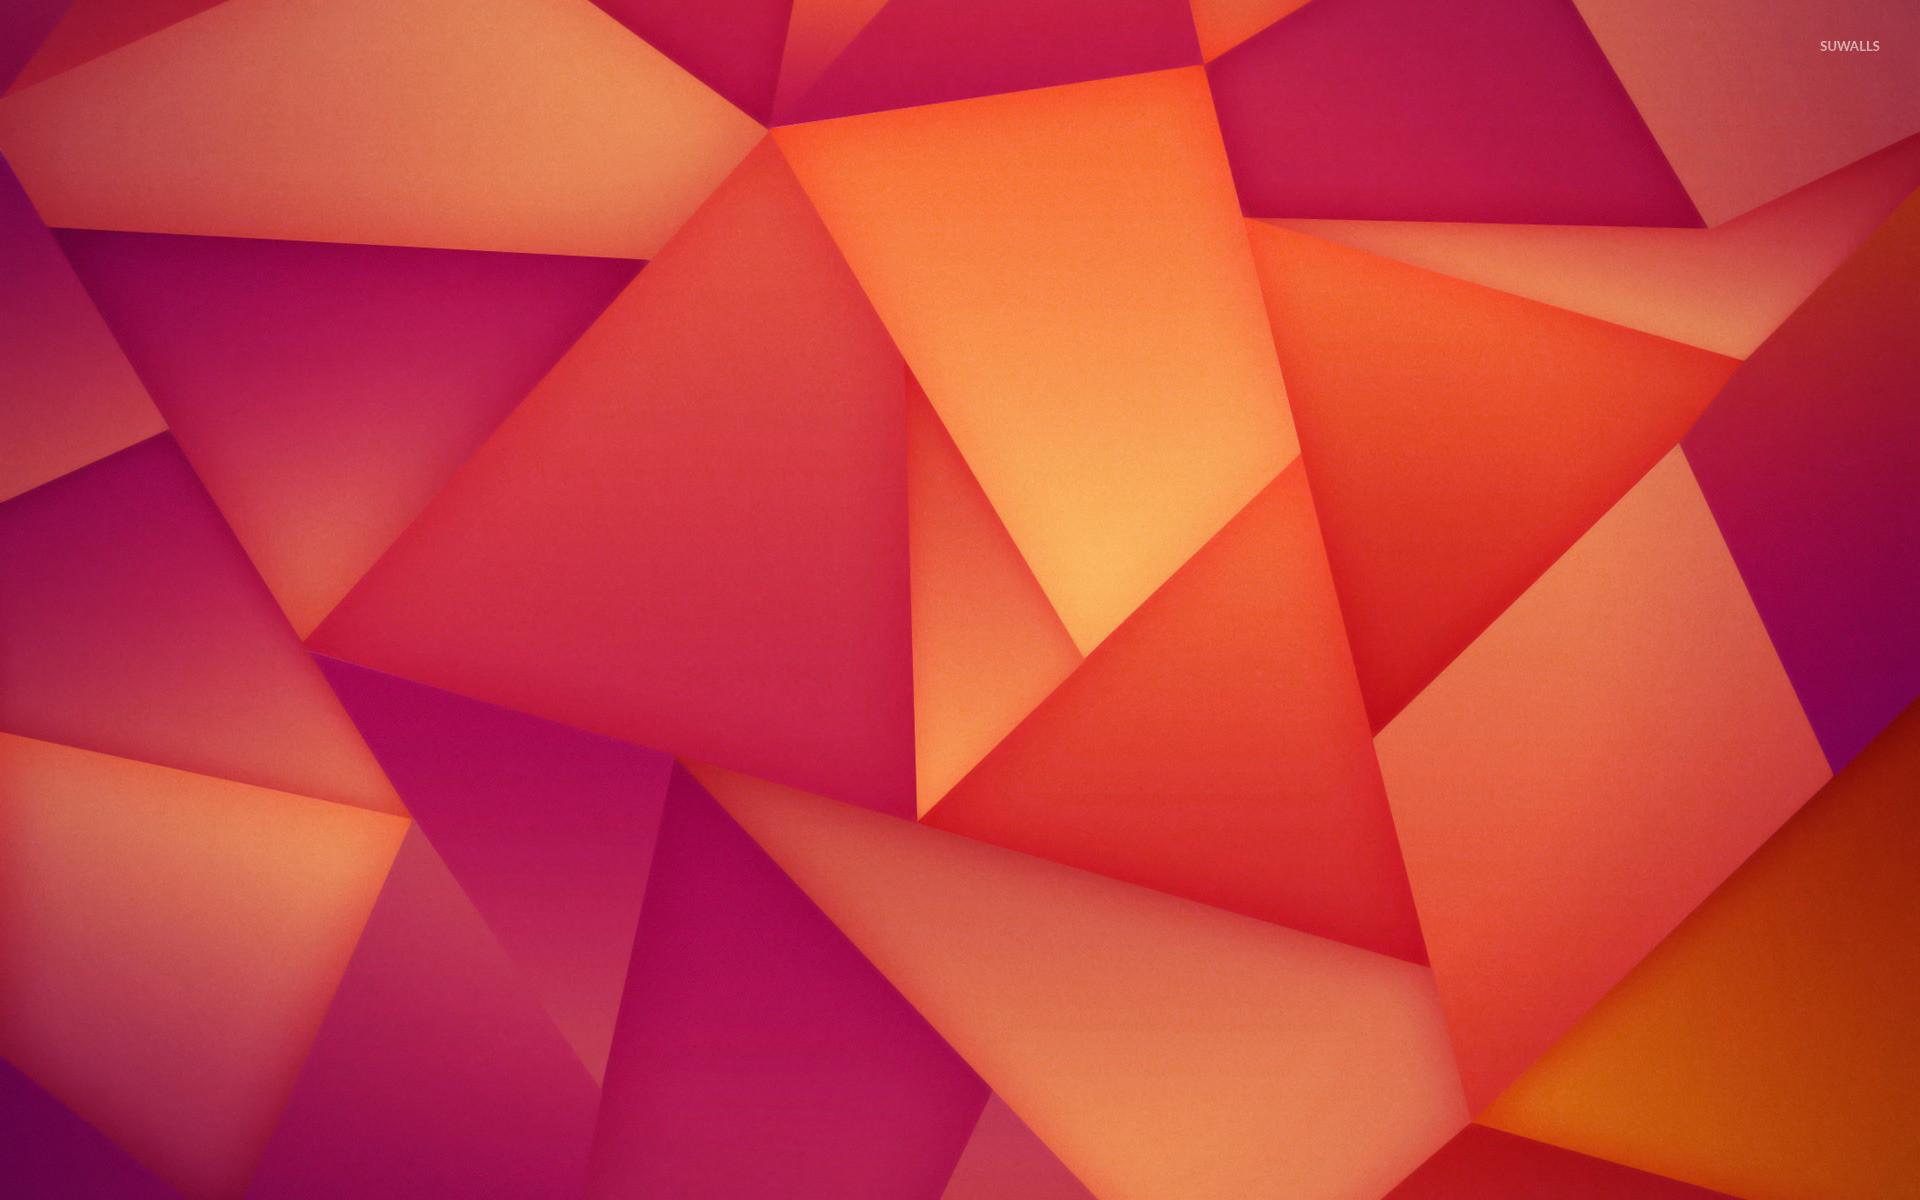 Orange and purple polygons wallpaper